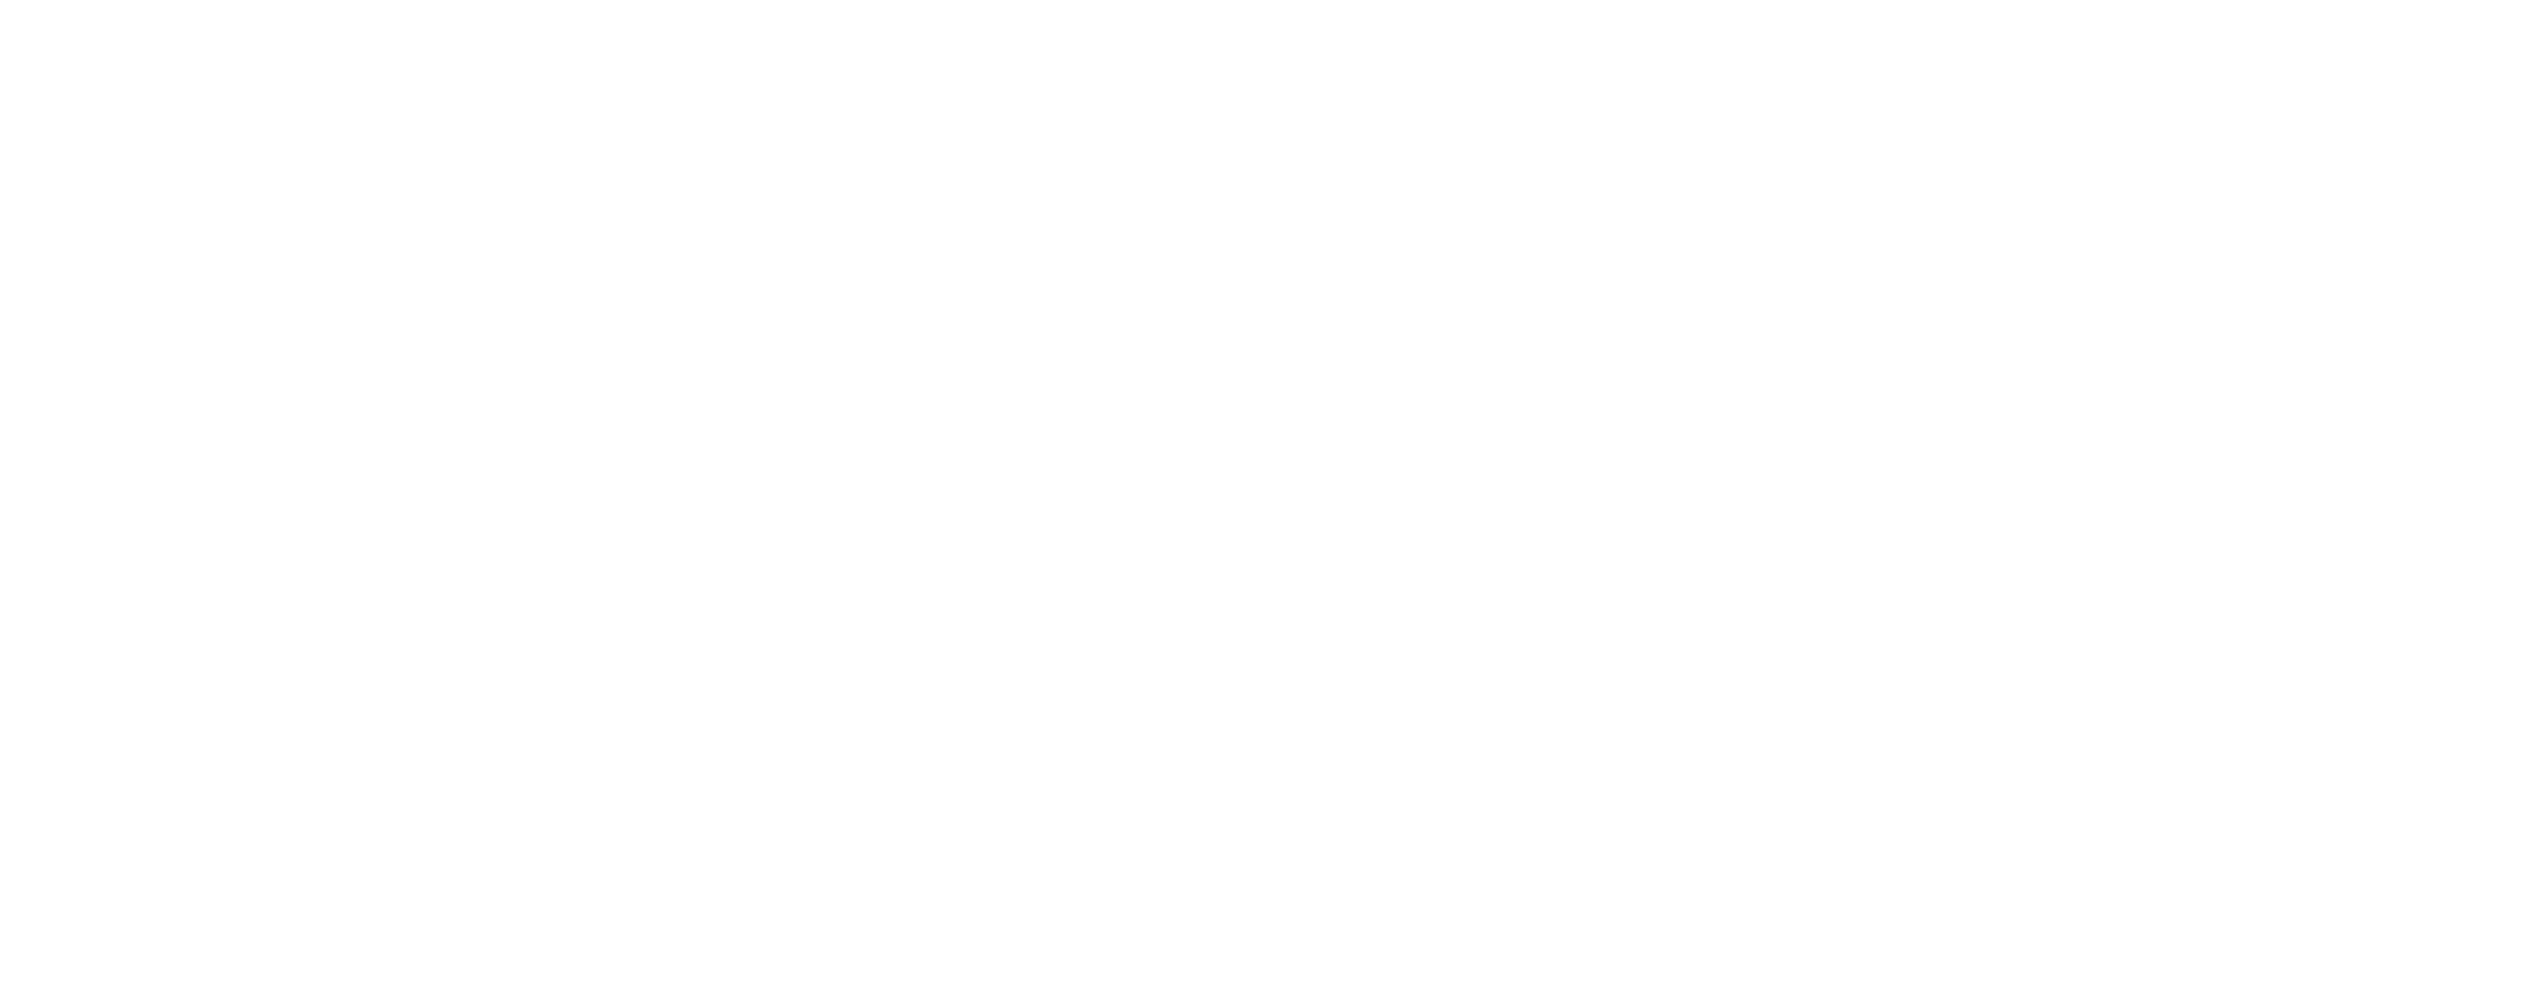 Freedman-2020-Logo&Tagline-02